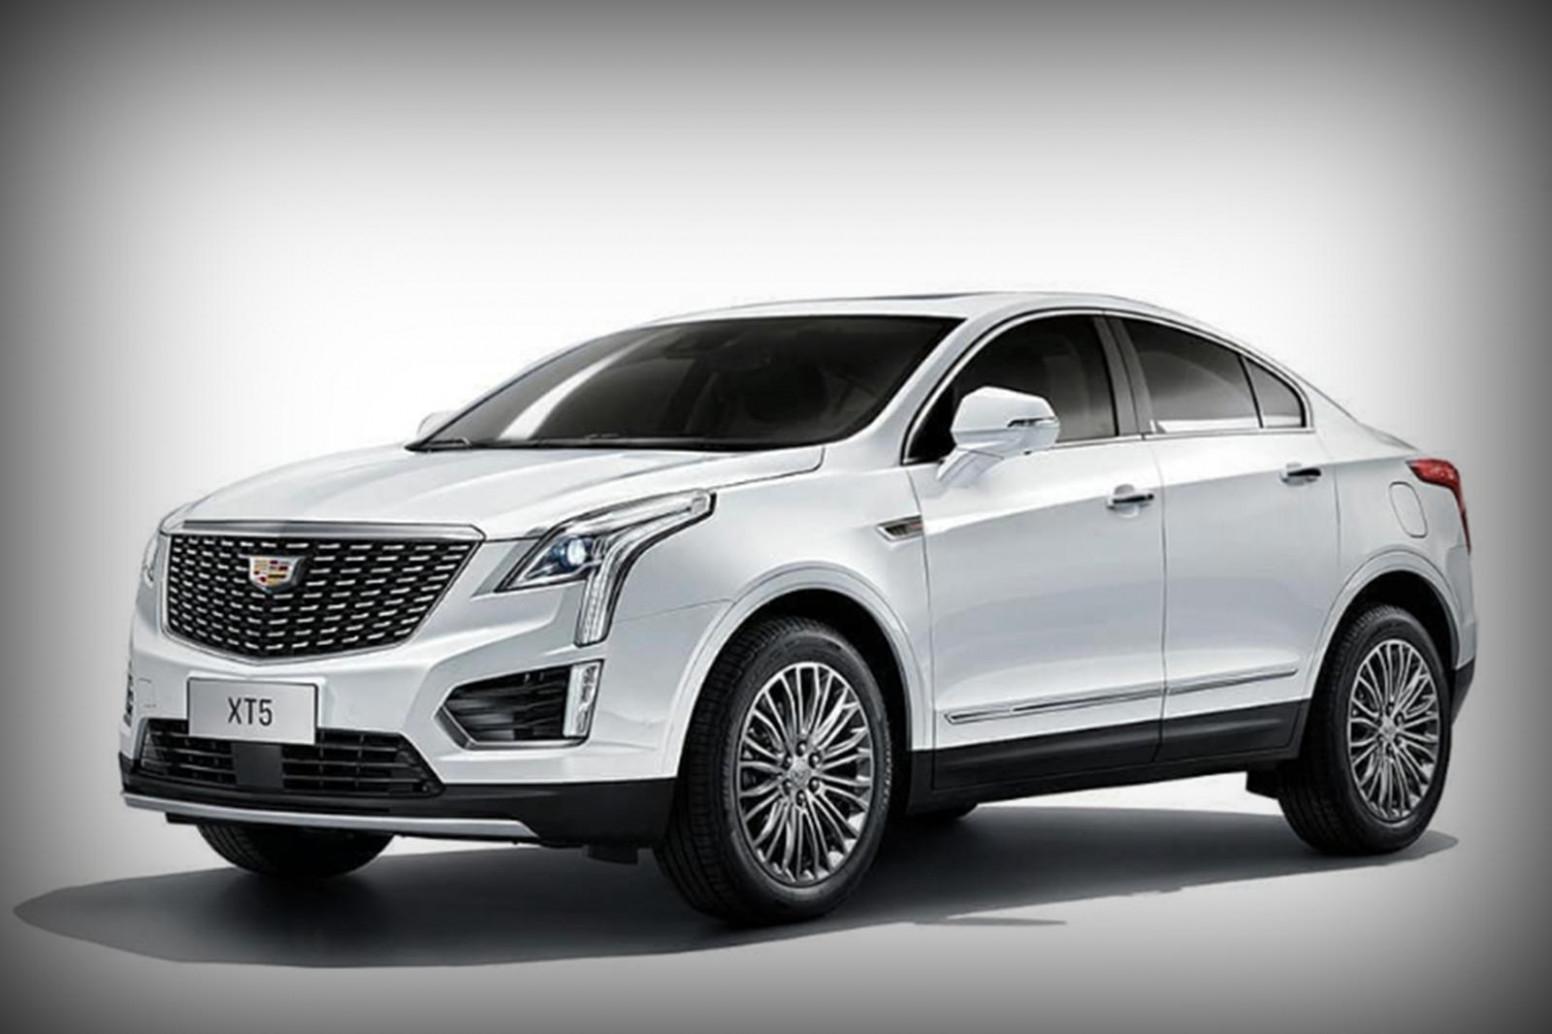 New Concept 2022 Spy Shots Cadillac Xt5